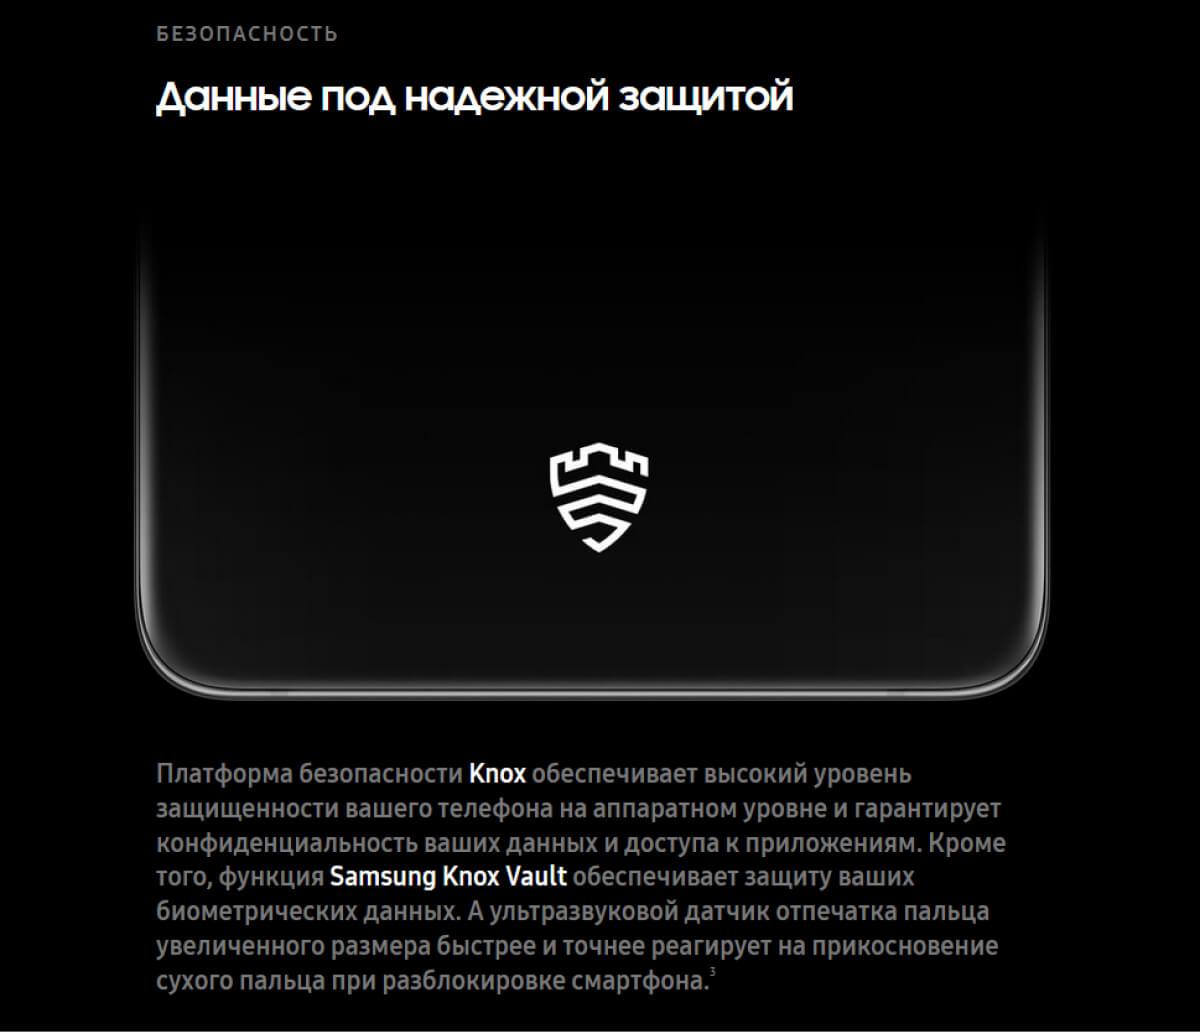 Samsung Galaxy S21 Ultra 5G Серебряный фантом цена